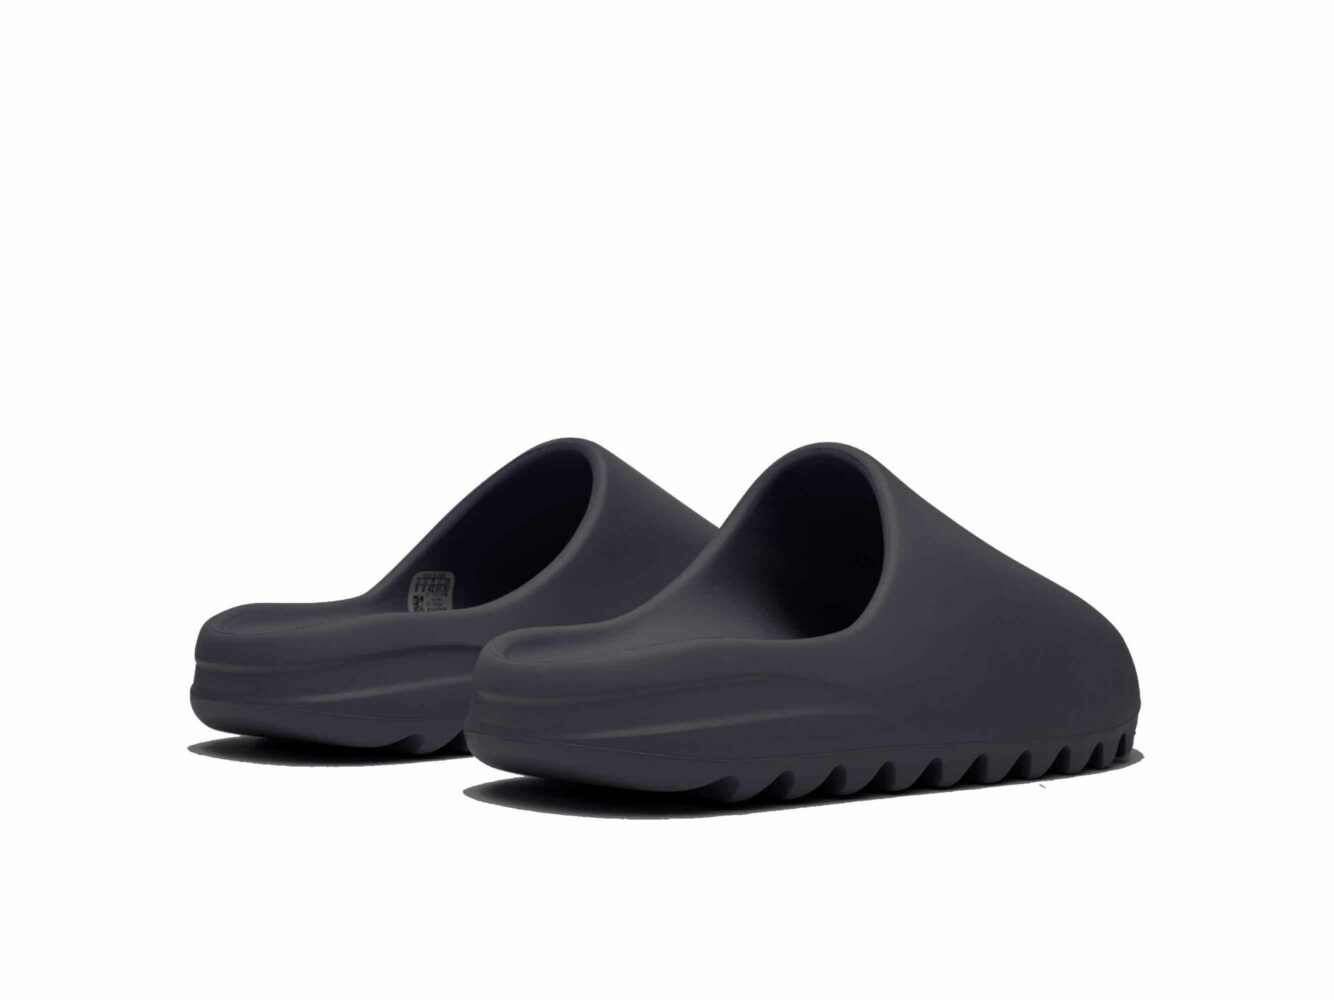 adidas yeezy slide core soot купить